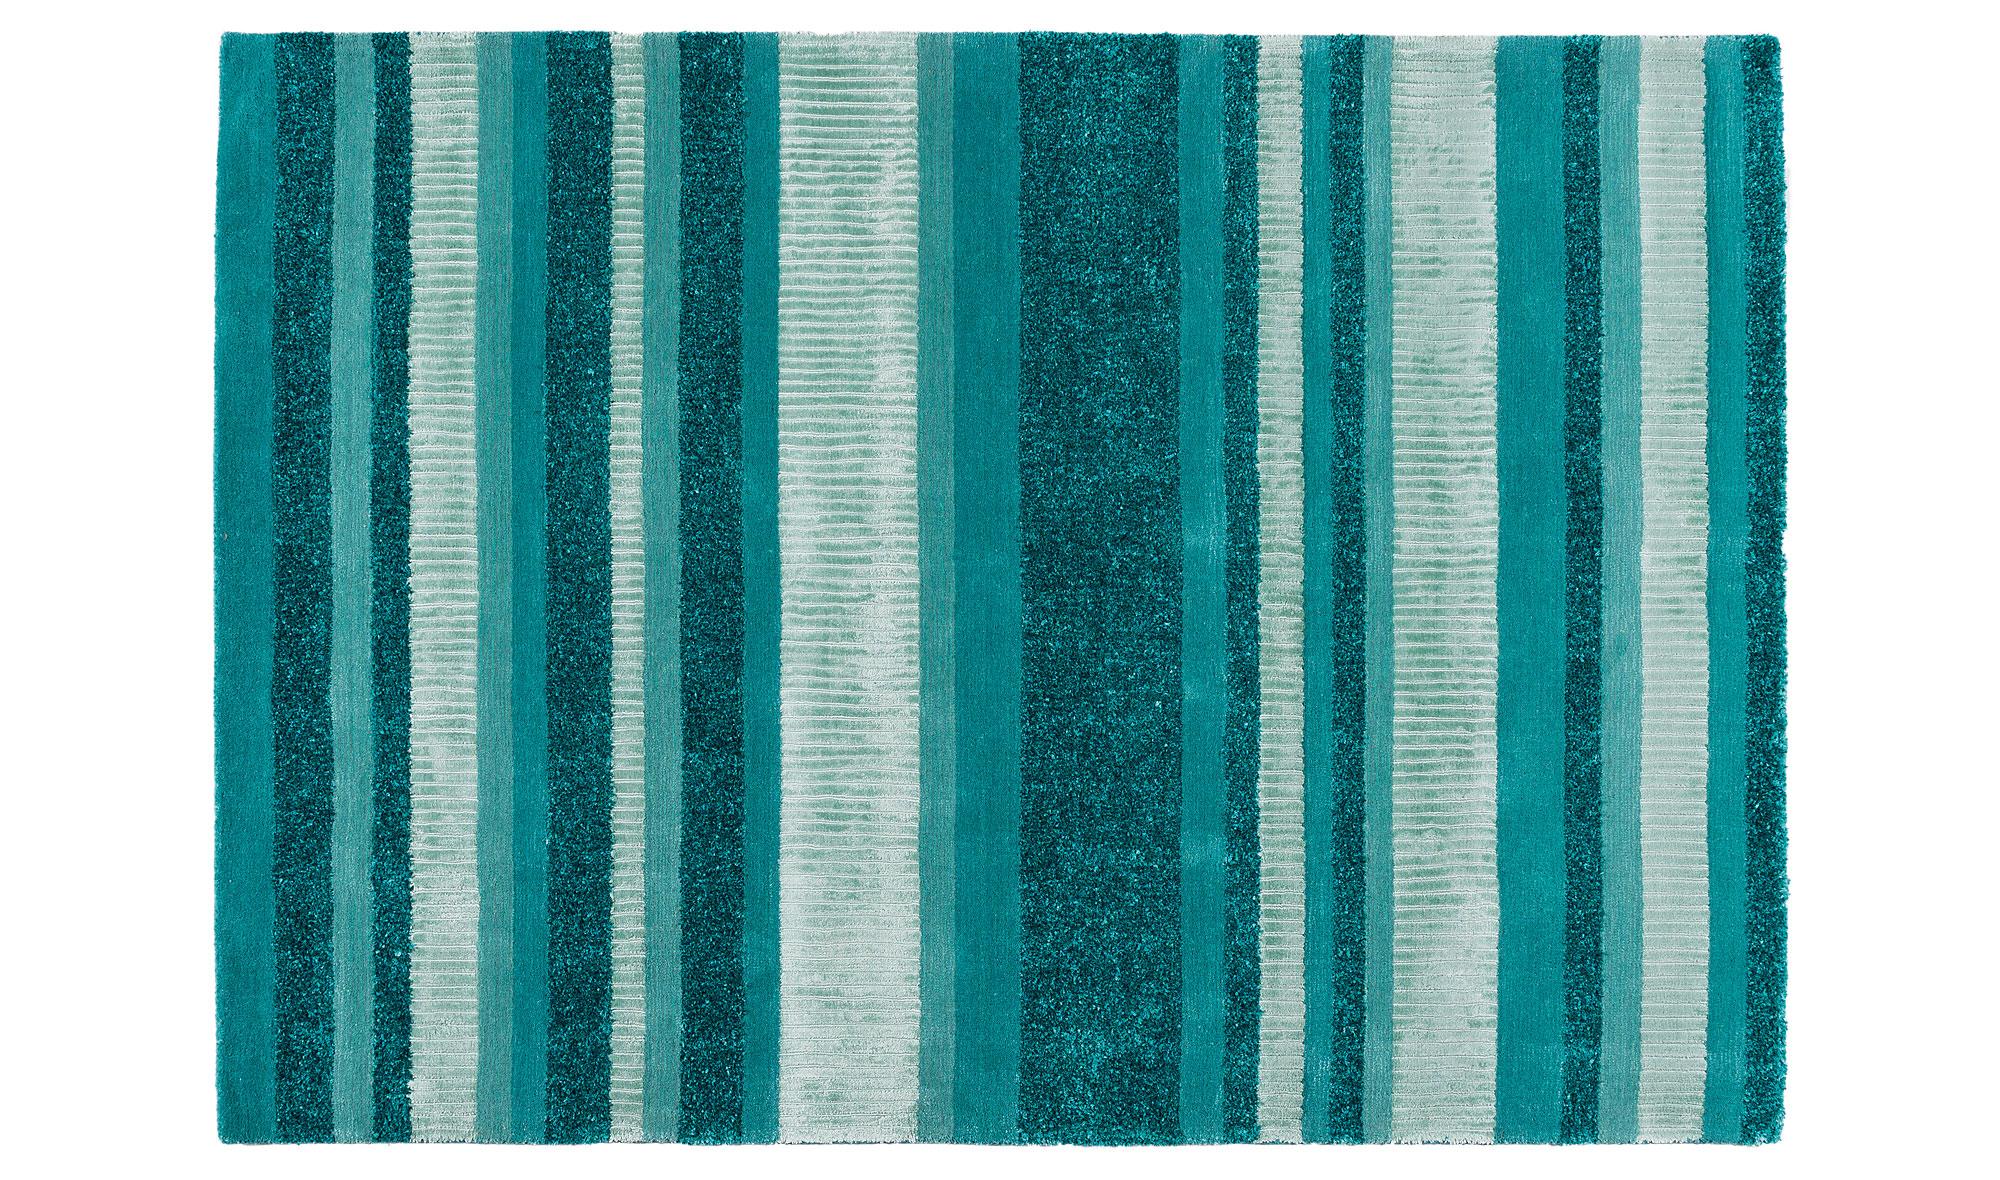 Alfombra altea turquesa en cosas de arquitectoscosas de for Alfombra azul turquesa del dormitorio